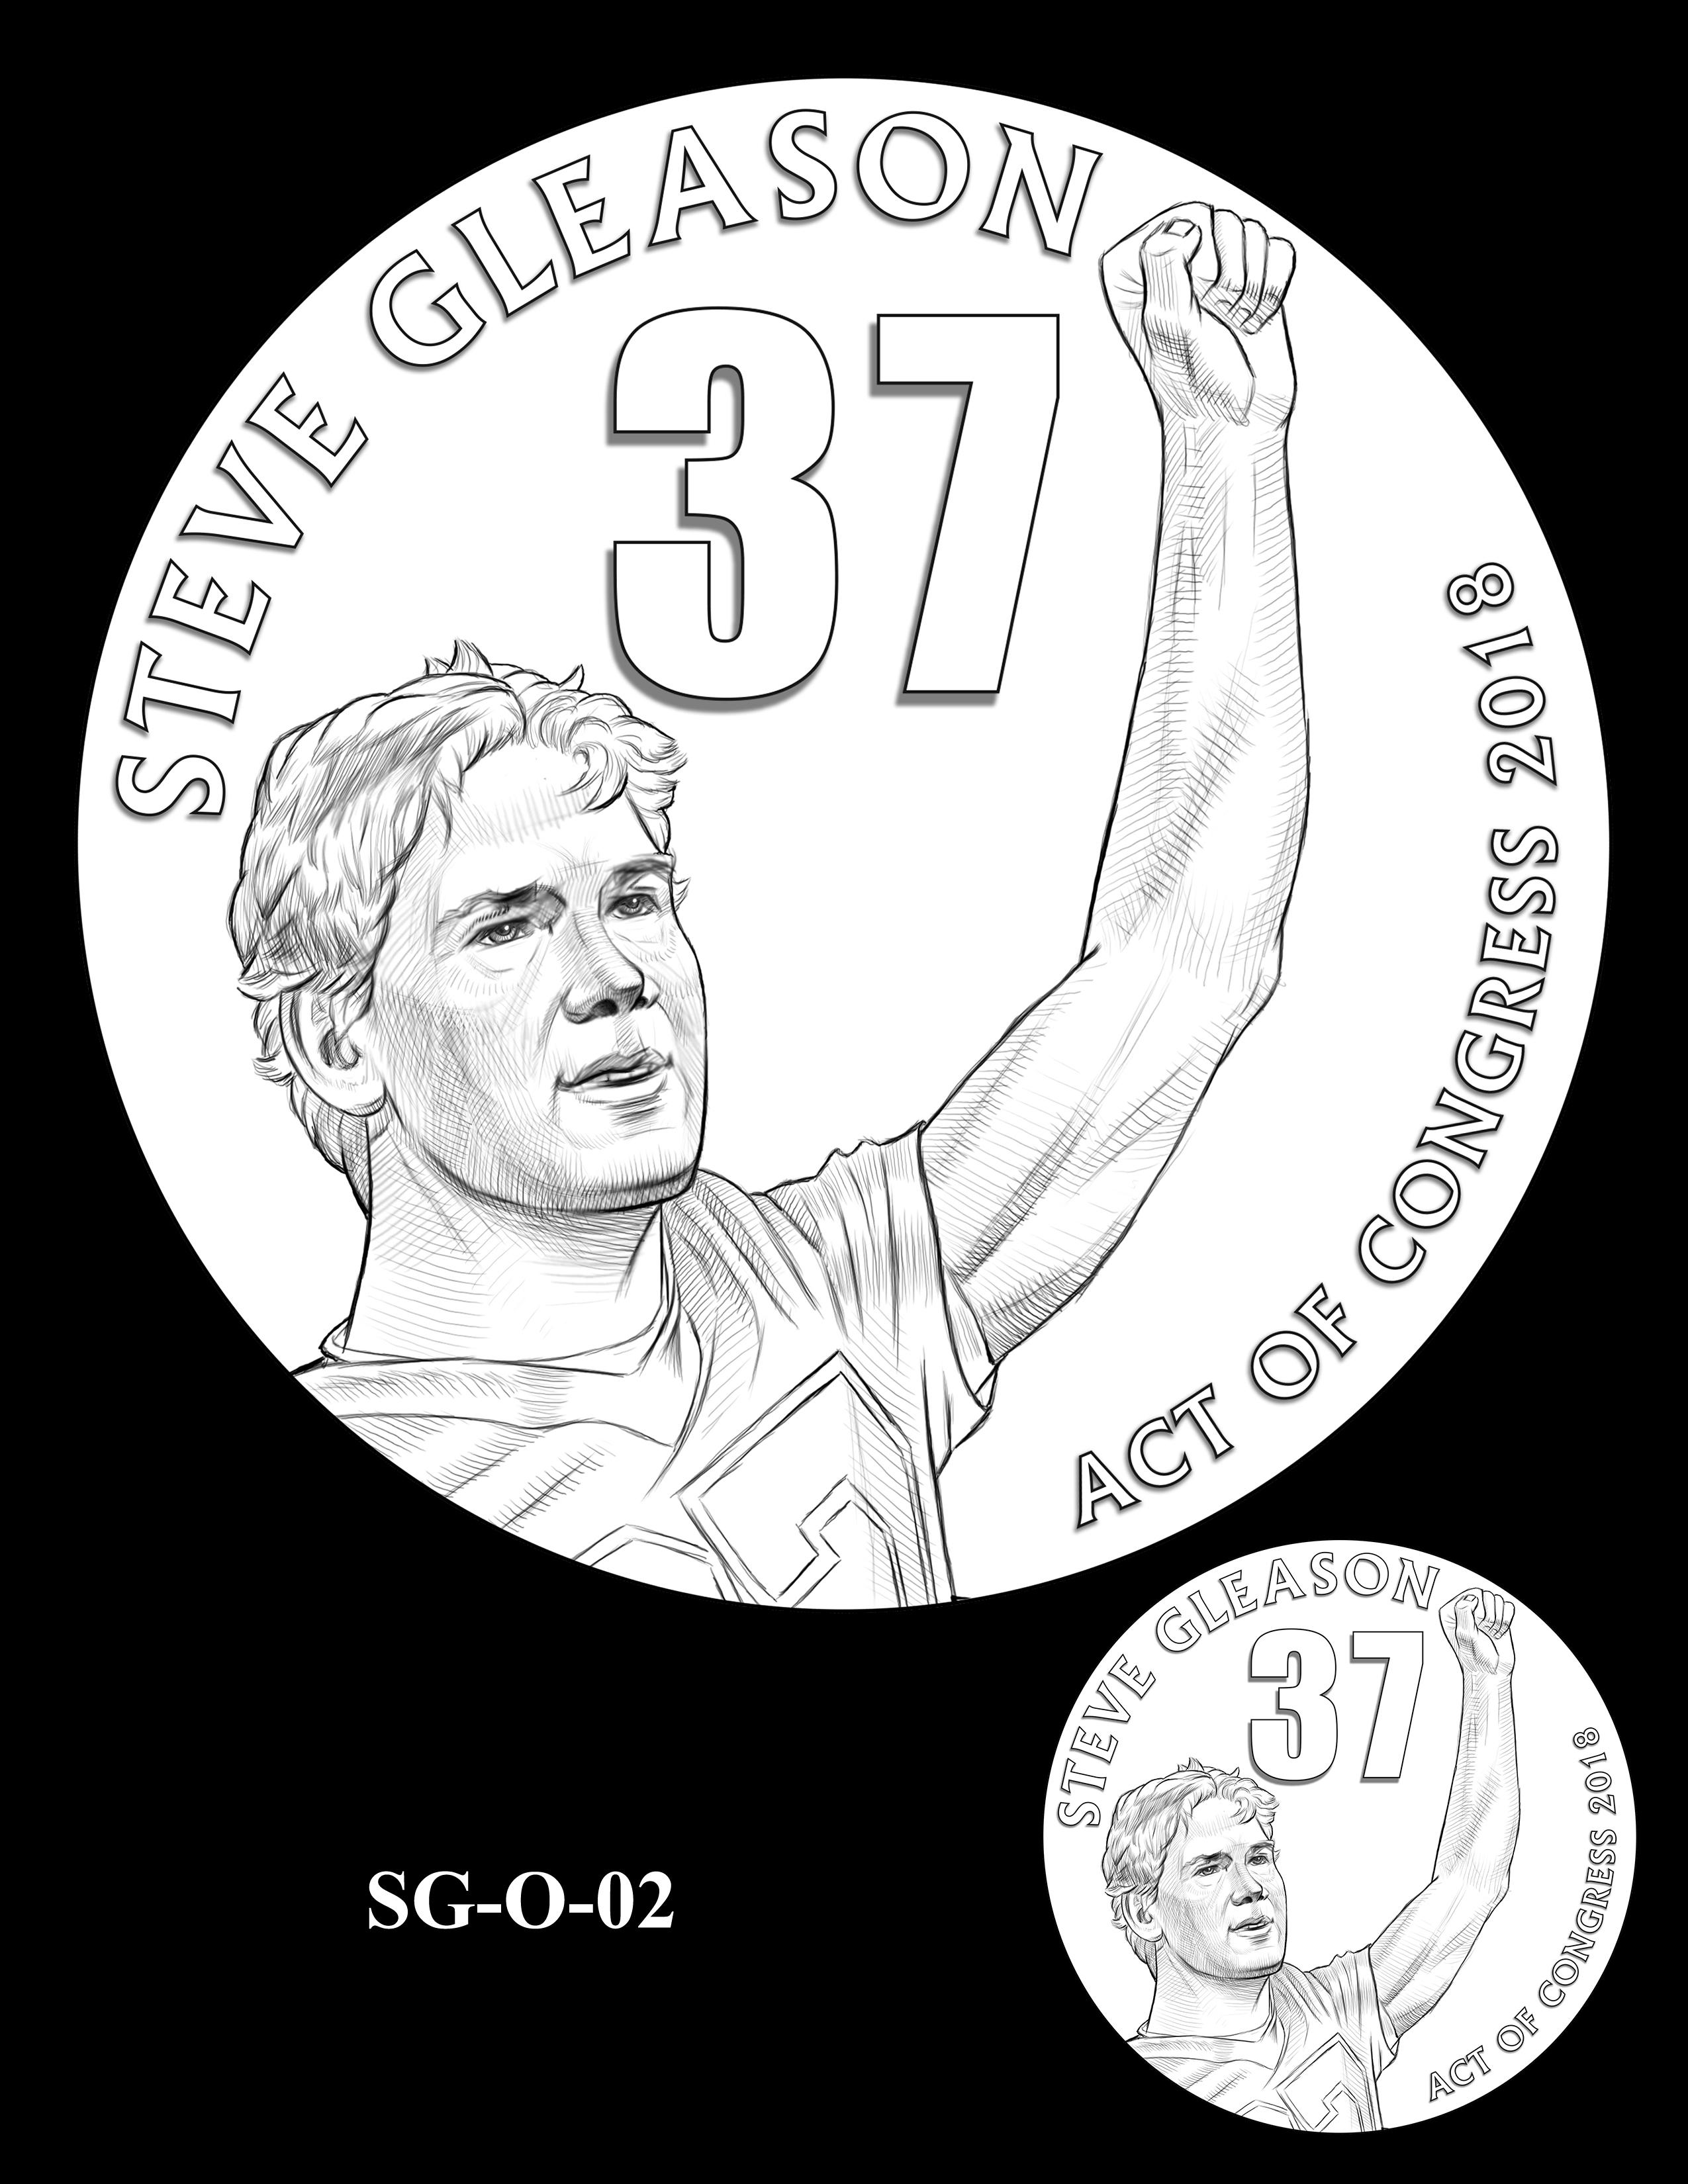 SG-O-02 -- Steve Gleason CGM Obverse